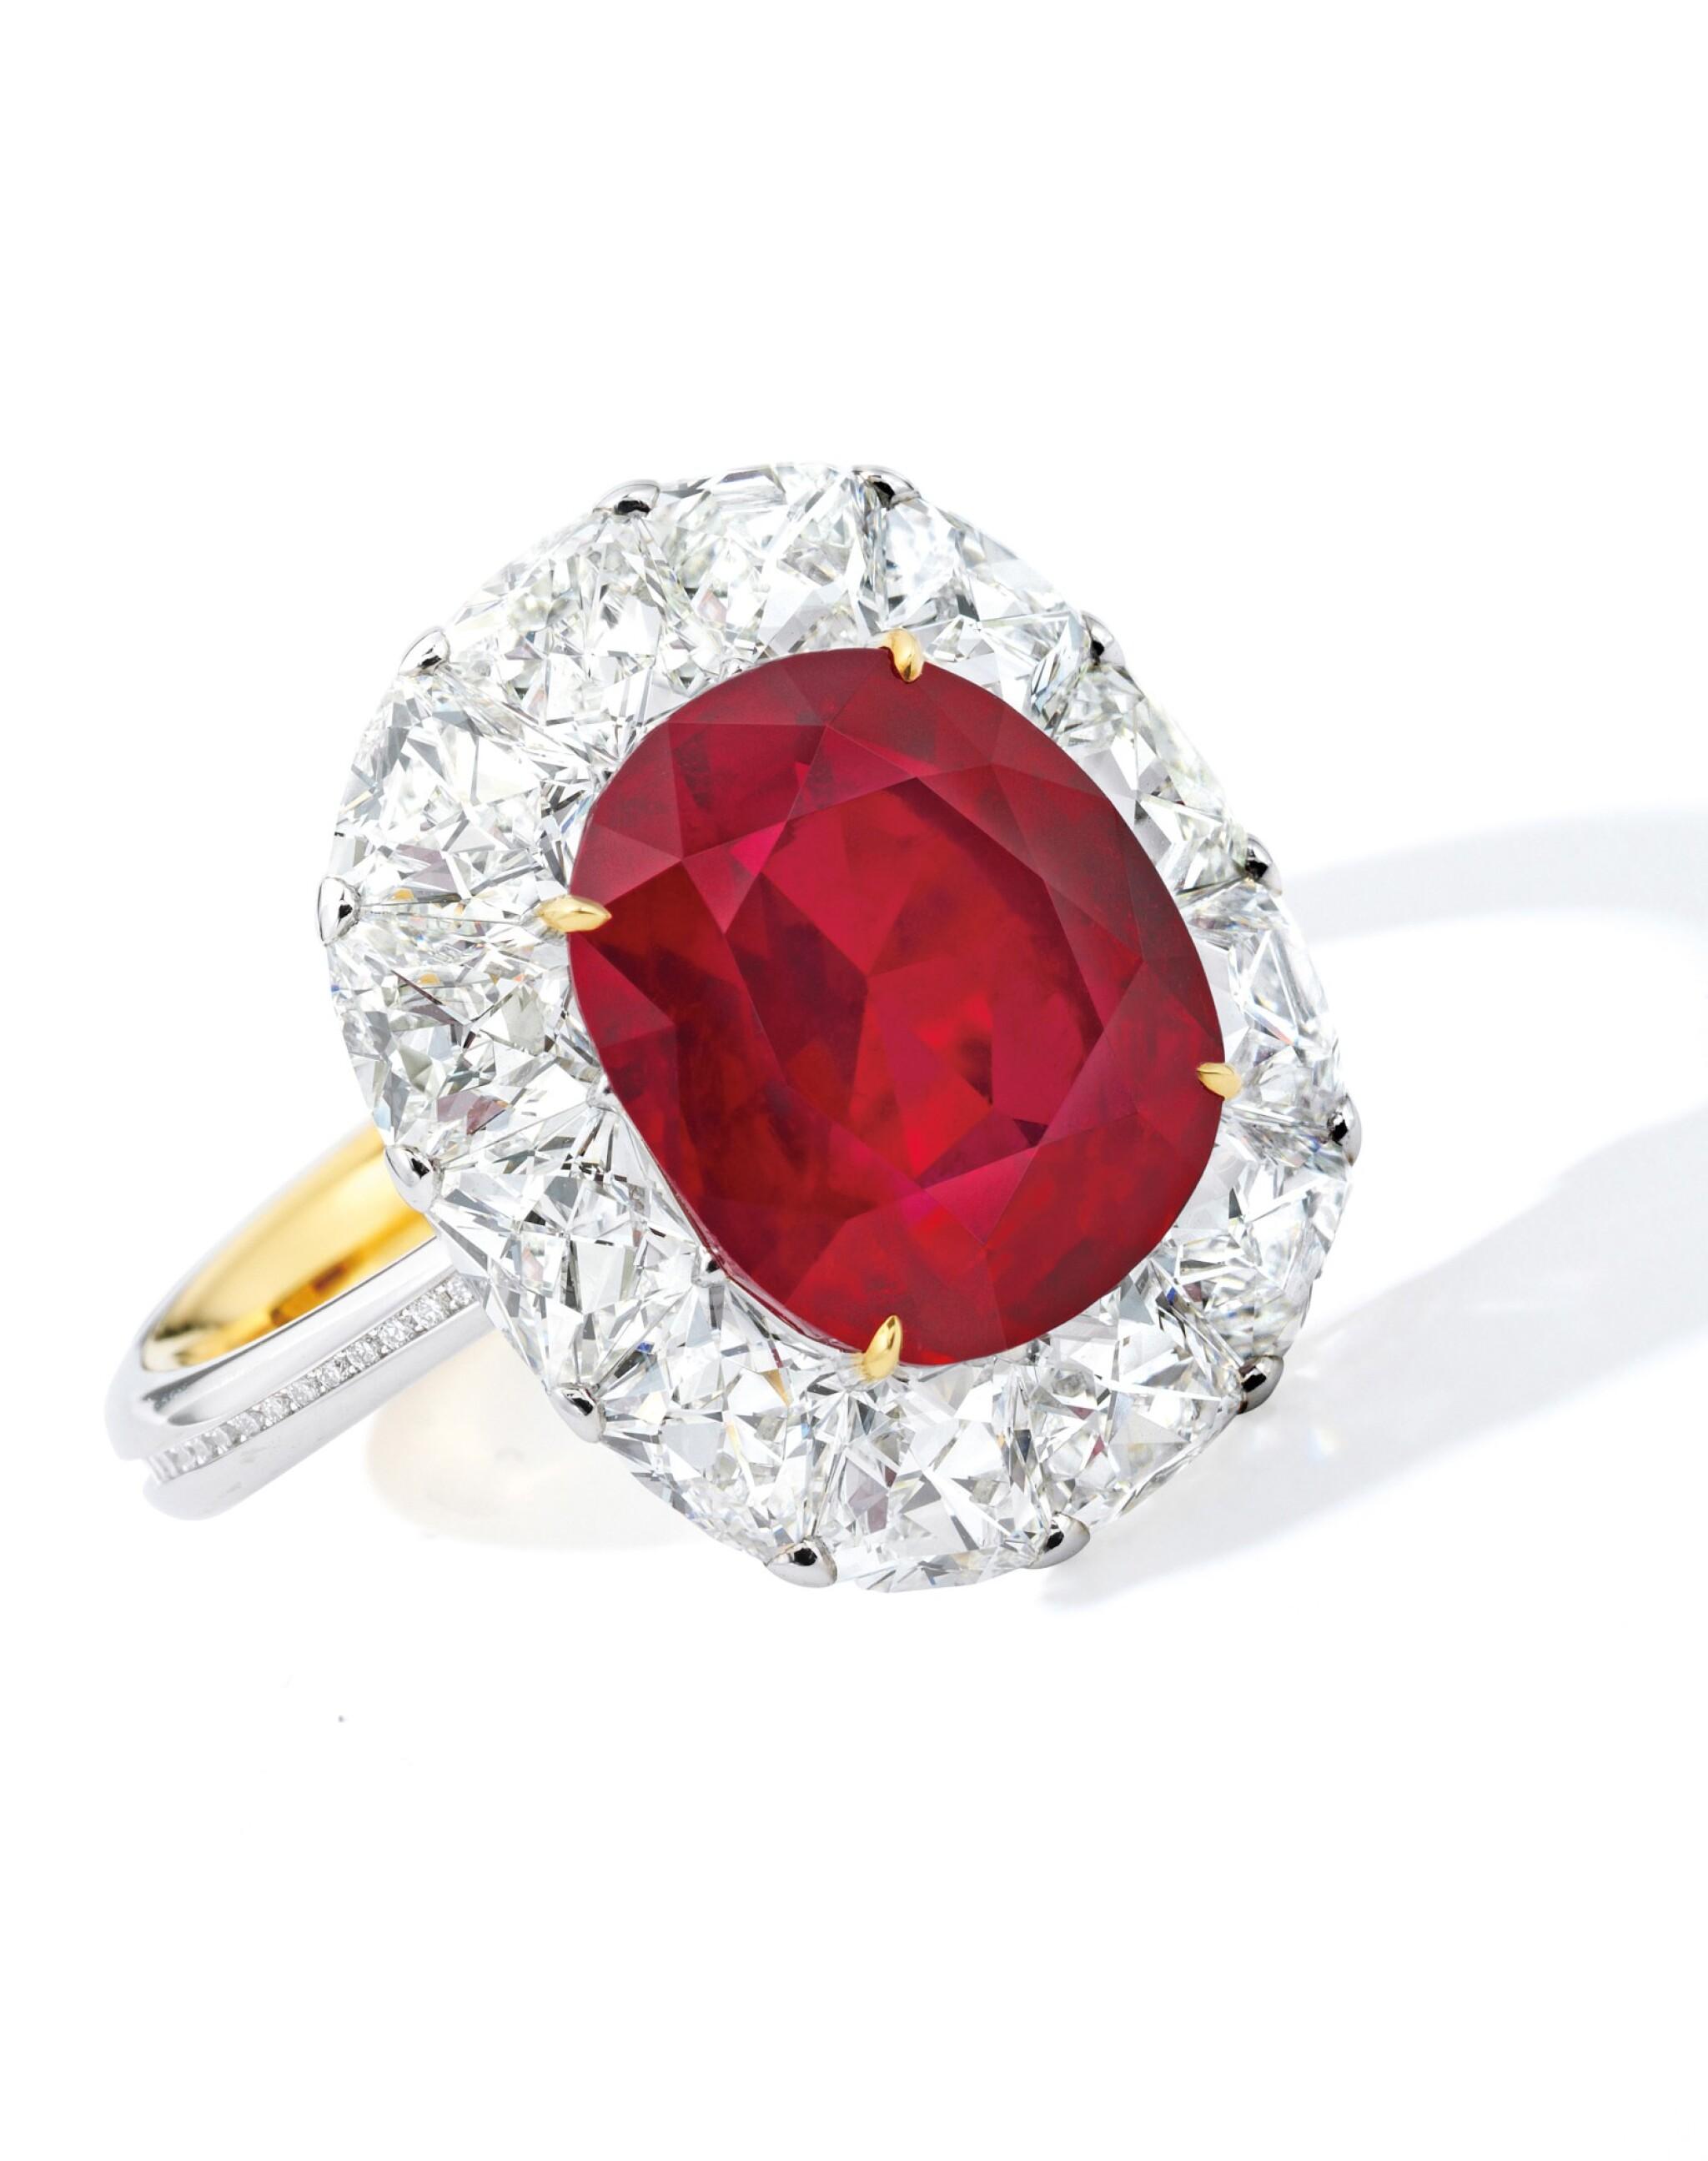 View 1 of Lot 1743. DESIGNED AND MOUNTED BY FORMS | AN EXCEPTIONAL RUBY AND DIAMOND RING | Forms 設計及鑲嵌 | 非常珍罕 6.41卡拉 天然「緬甸鴿血紅」未經加熱紅寶石 配 鑽石 戒指 戒指.